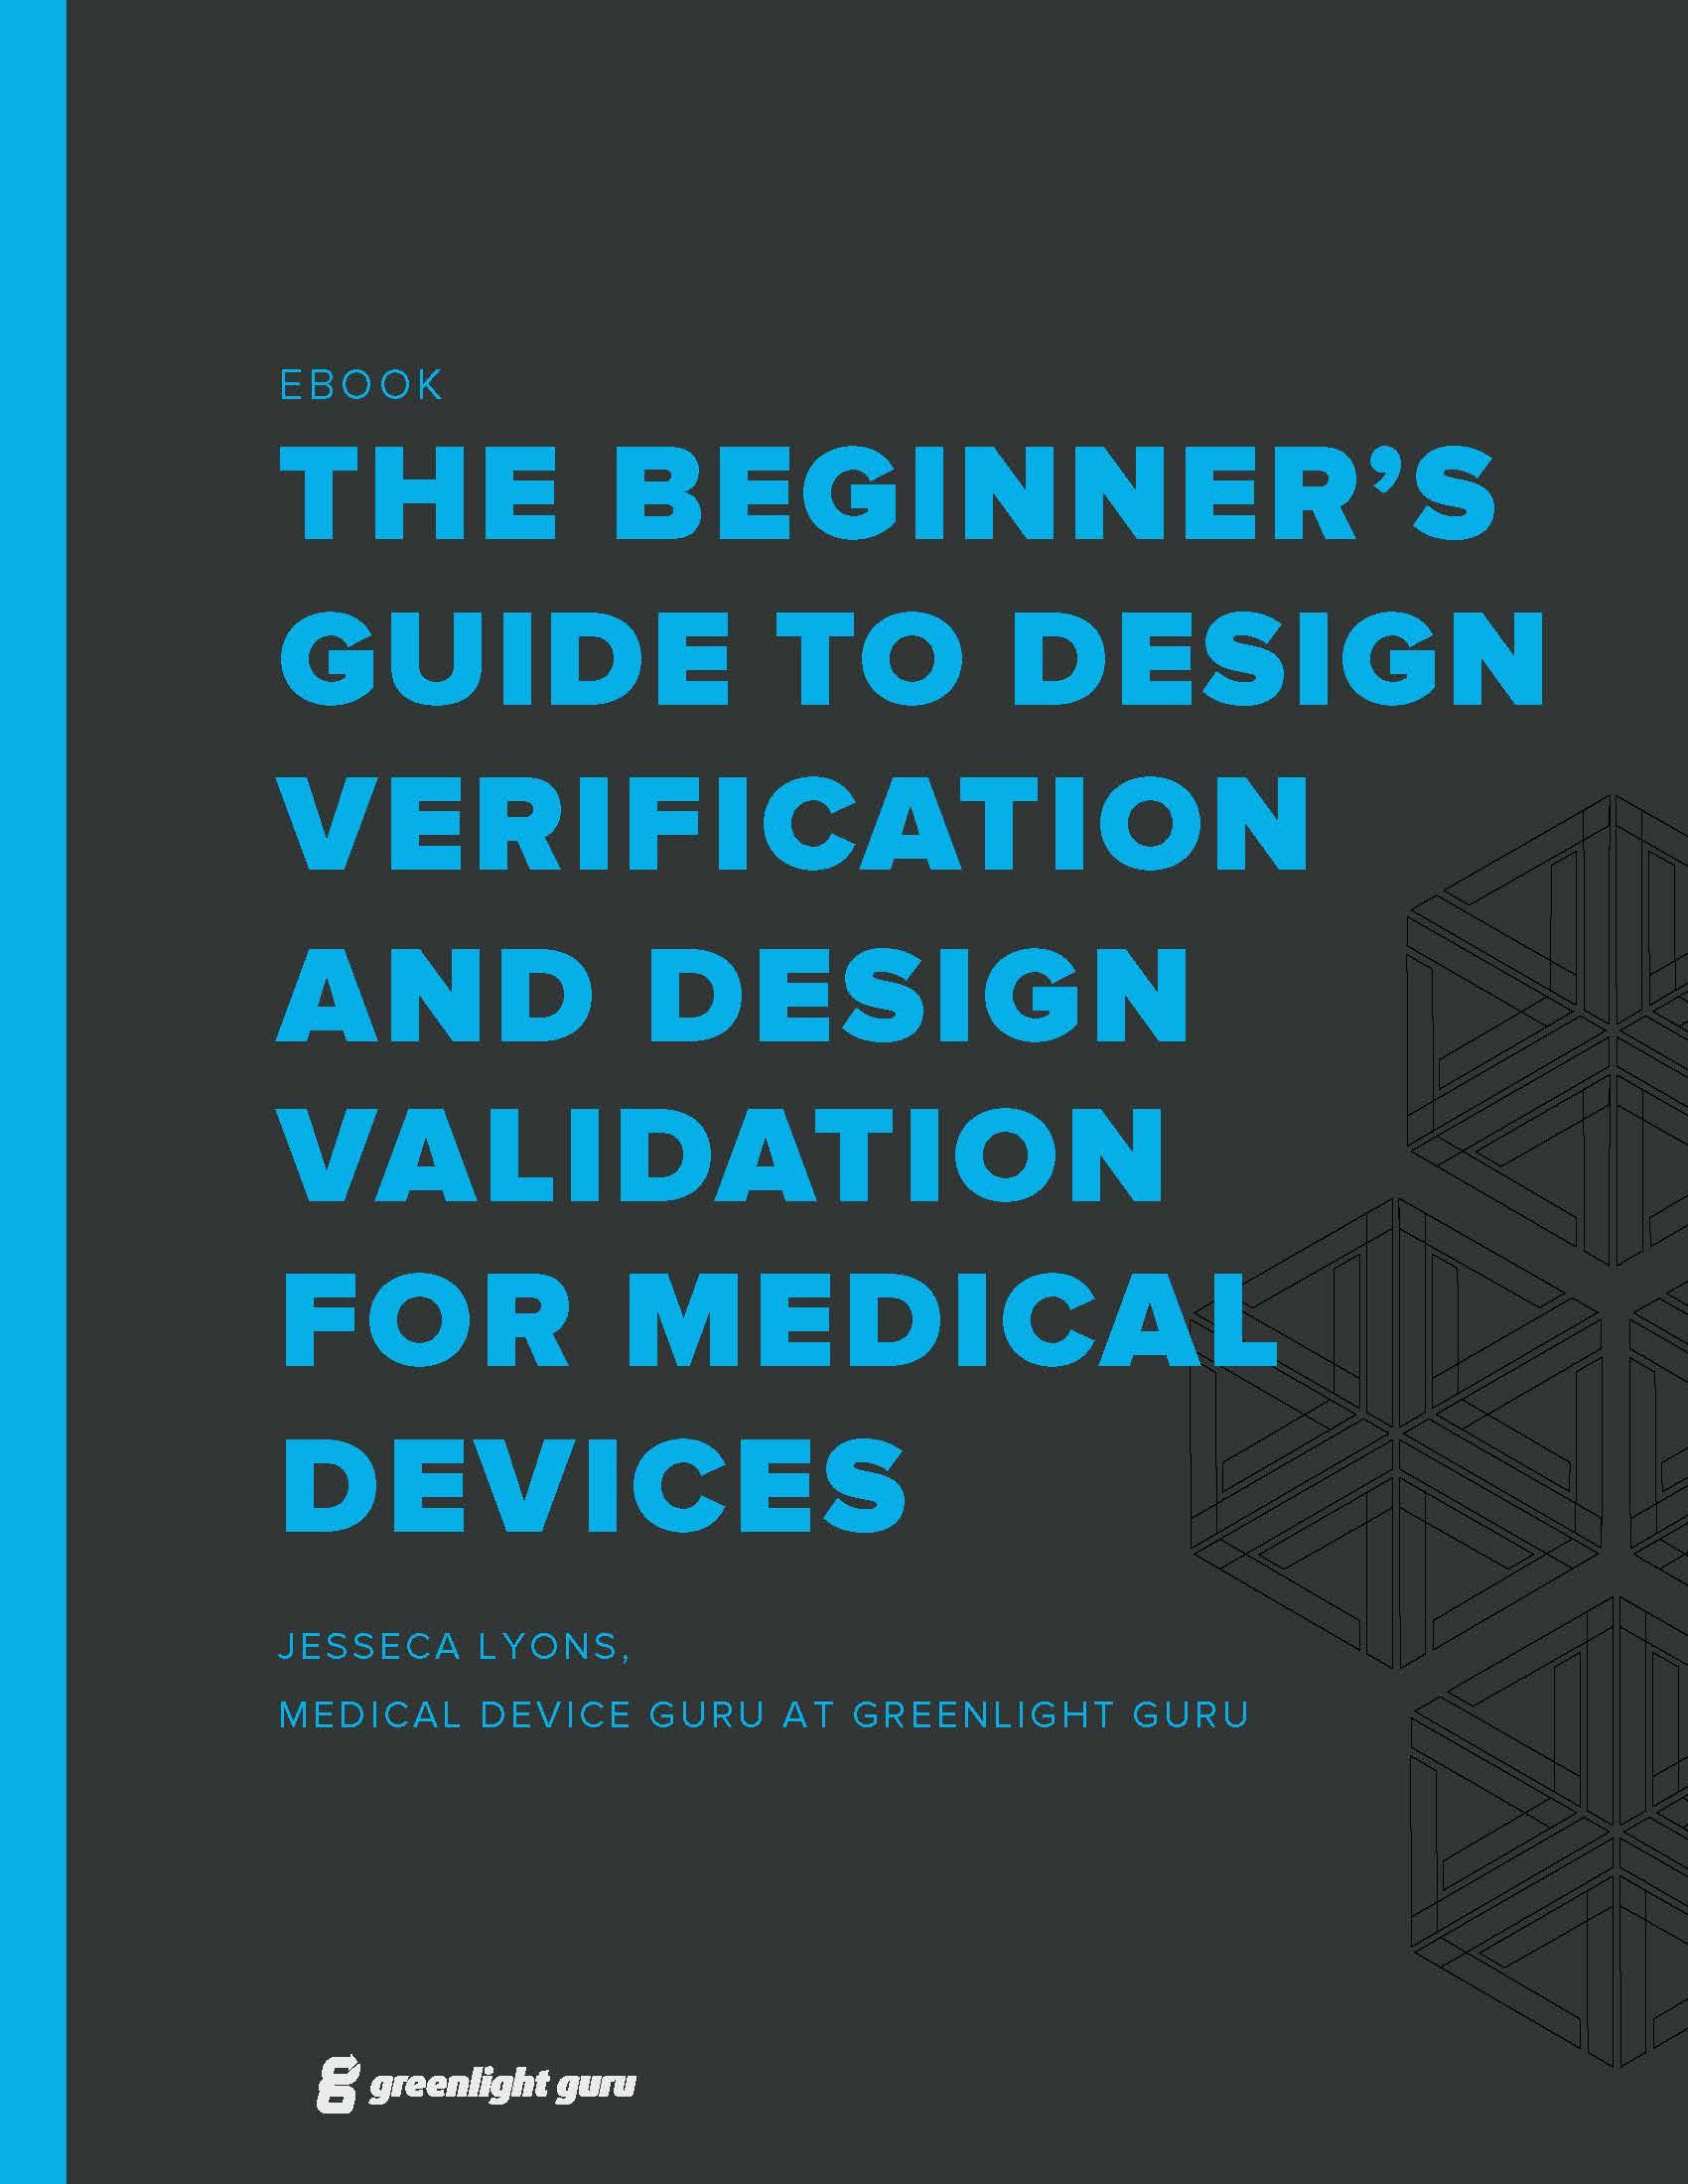 Design Verification & Validation for Medical Devices